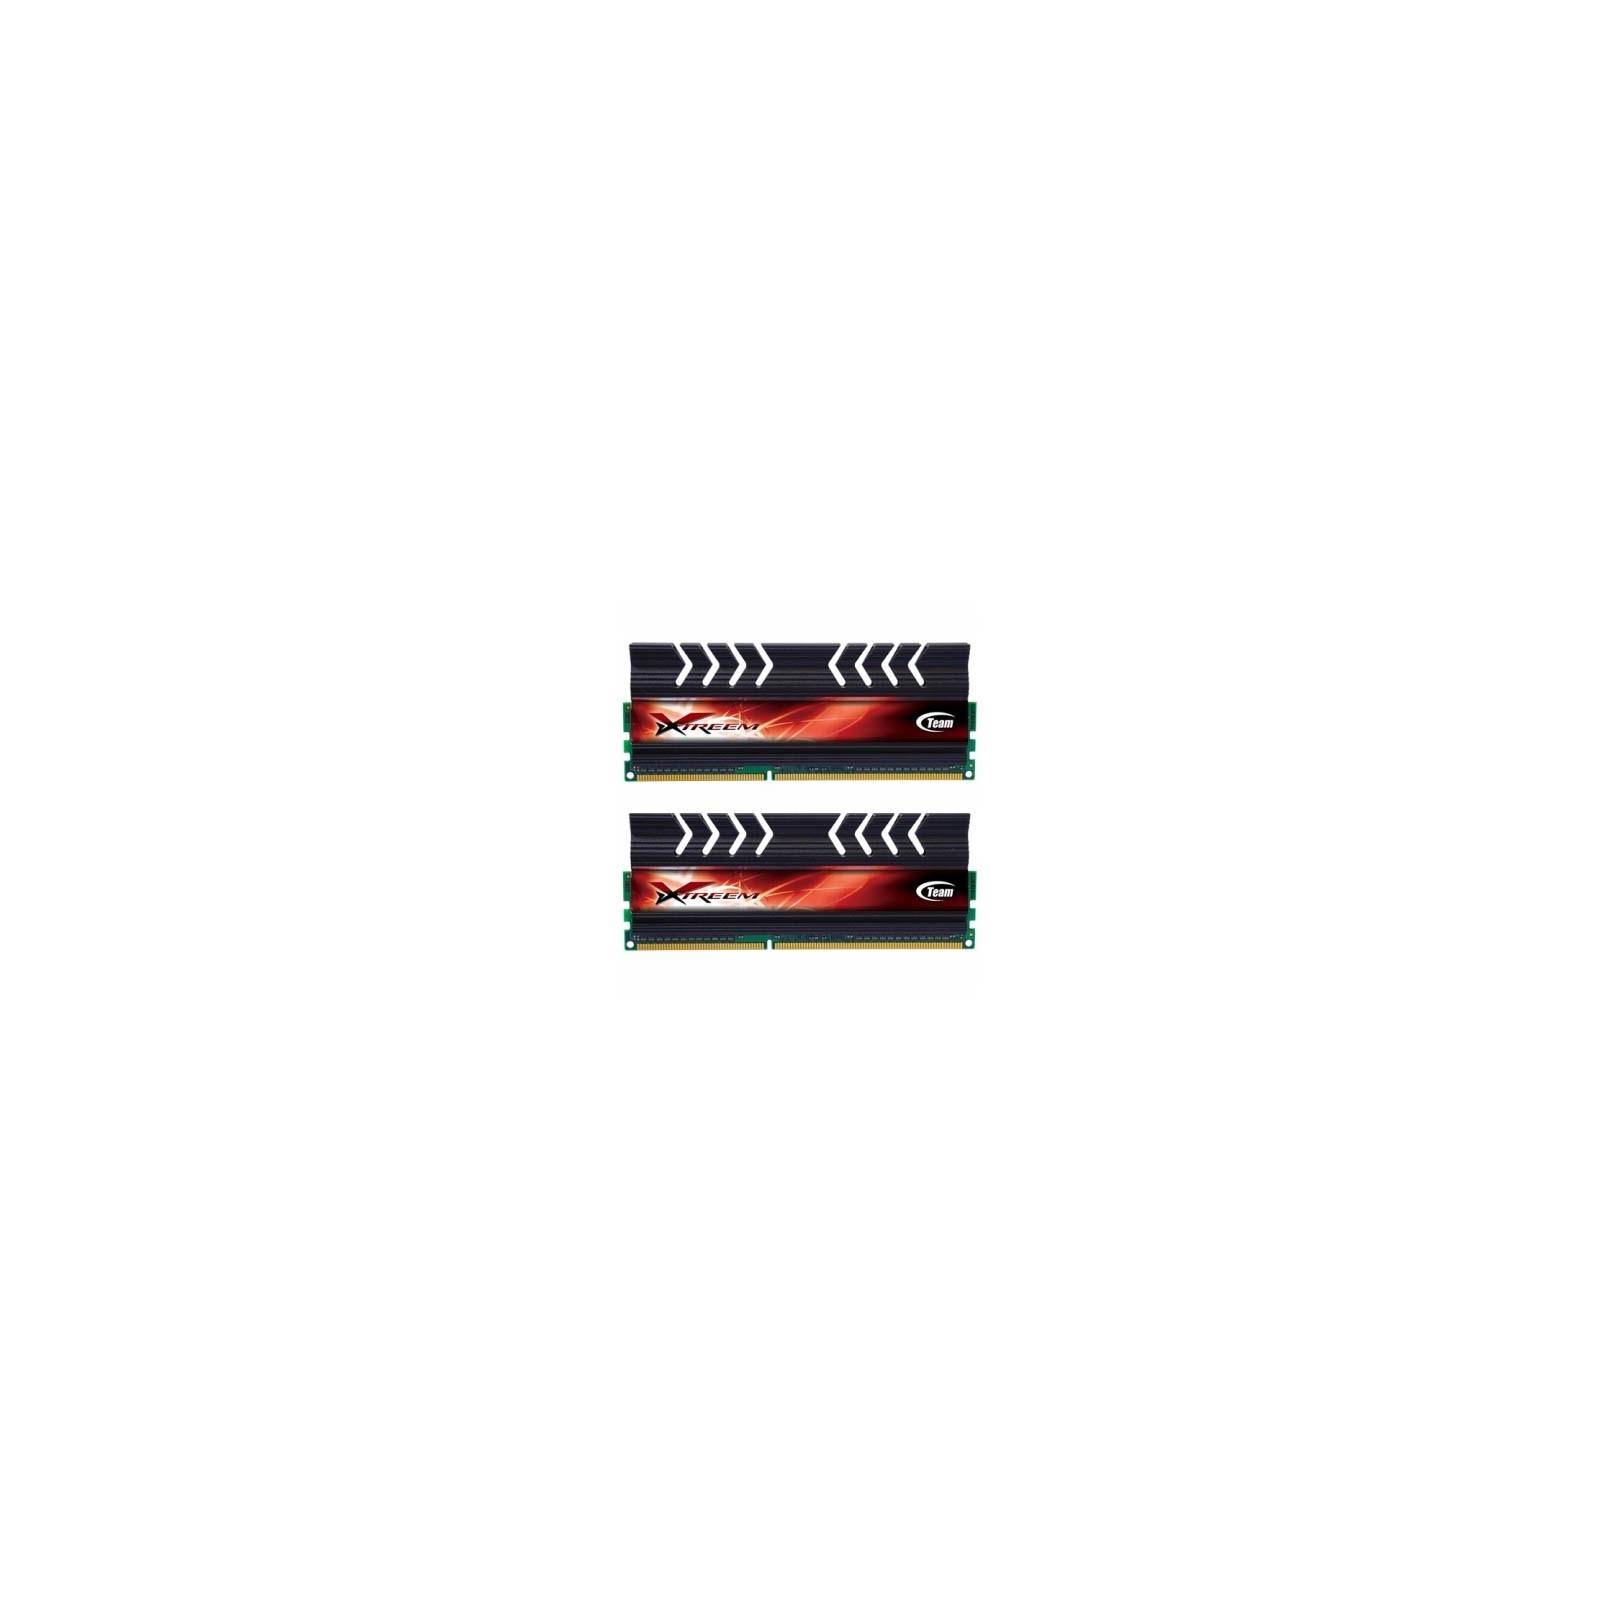 Модуль памяти для компьютера DDR3 8GB (2x4GB) 2666 MHz Team (TXD38G2666HC10QDC01)